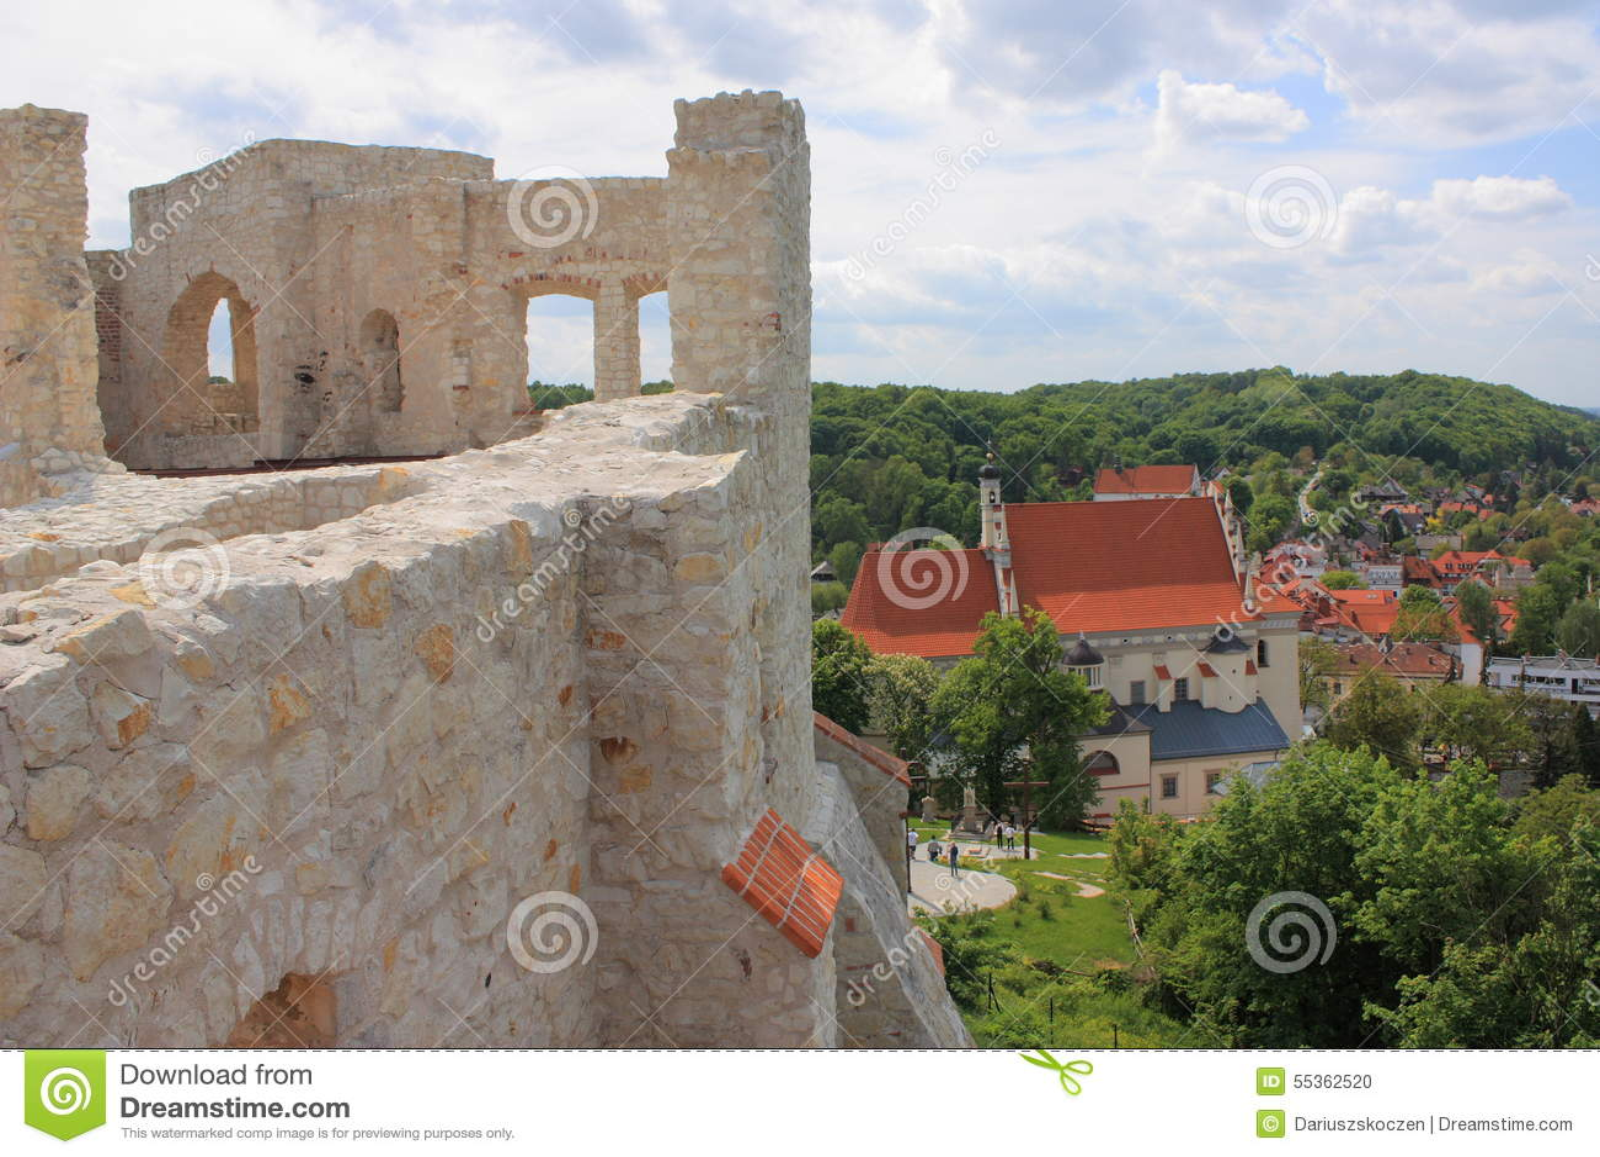 La Polonia, Kazimierz Dolny, le rovine del castello